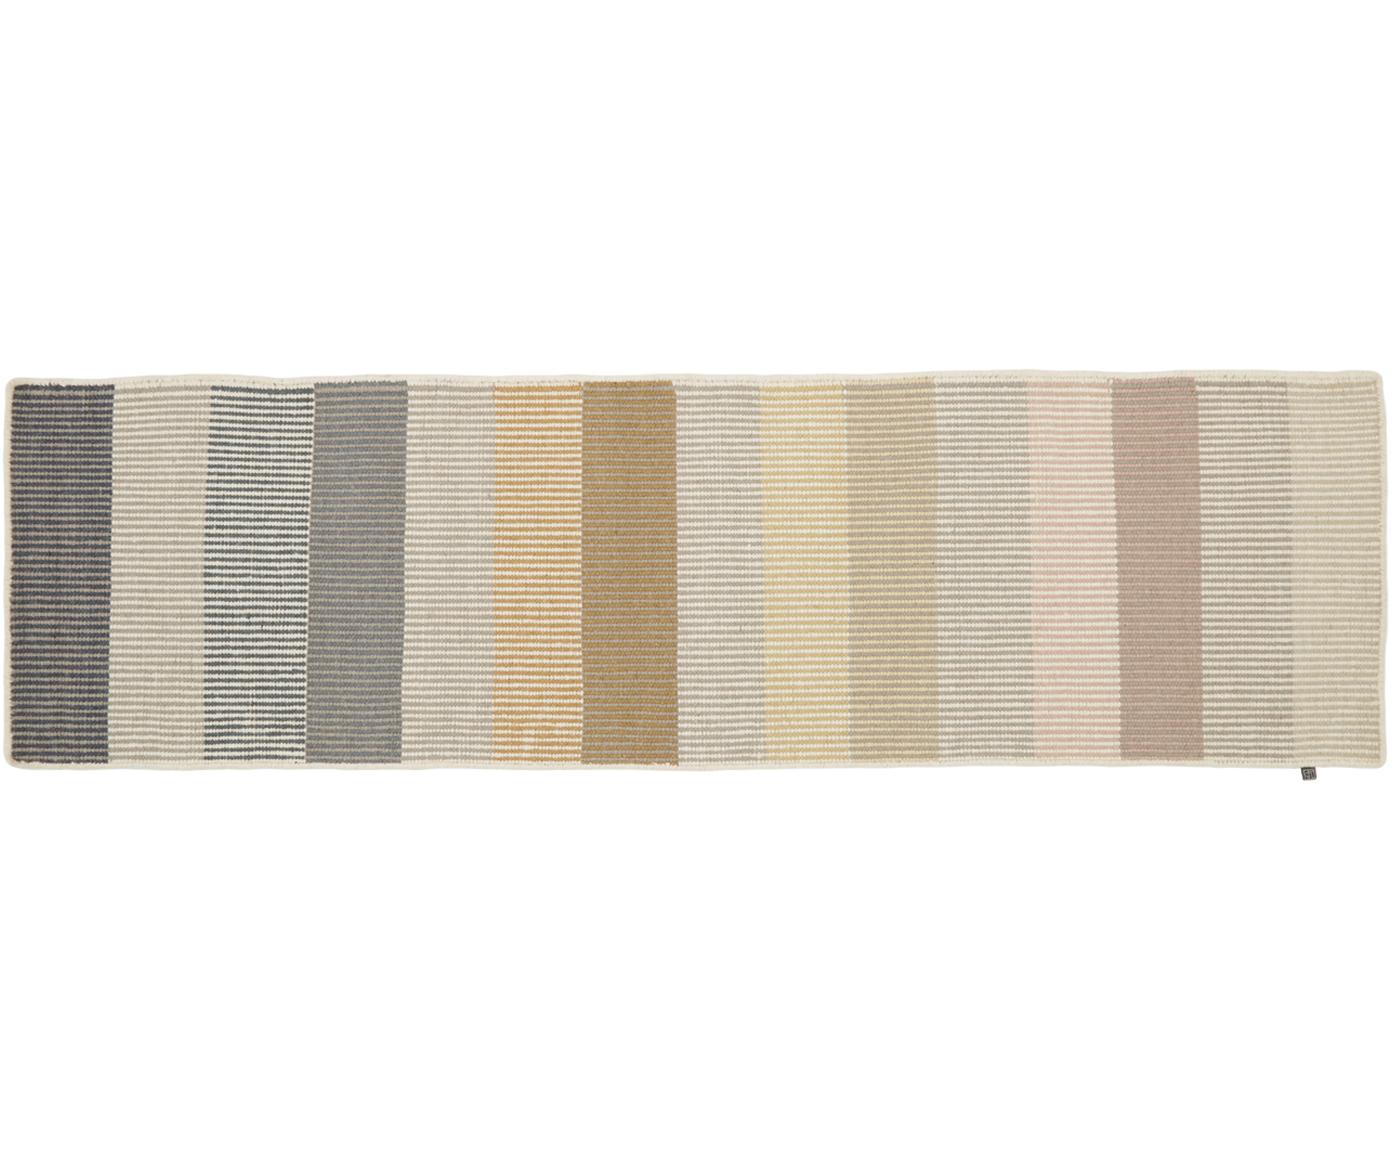 Passatoia in lana a righe Devise, Multicolore, Larg. 80 x Lung. 280 cm